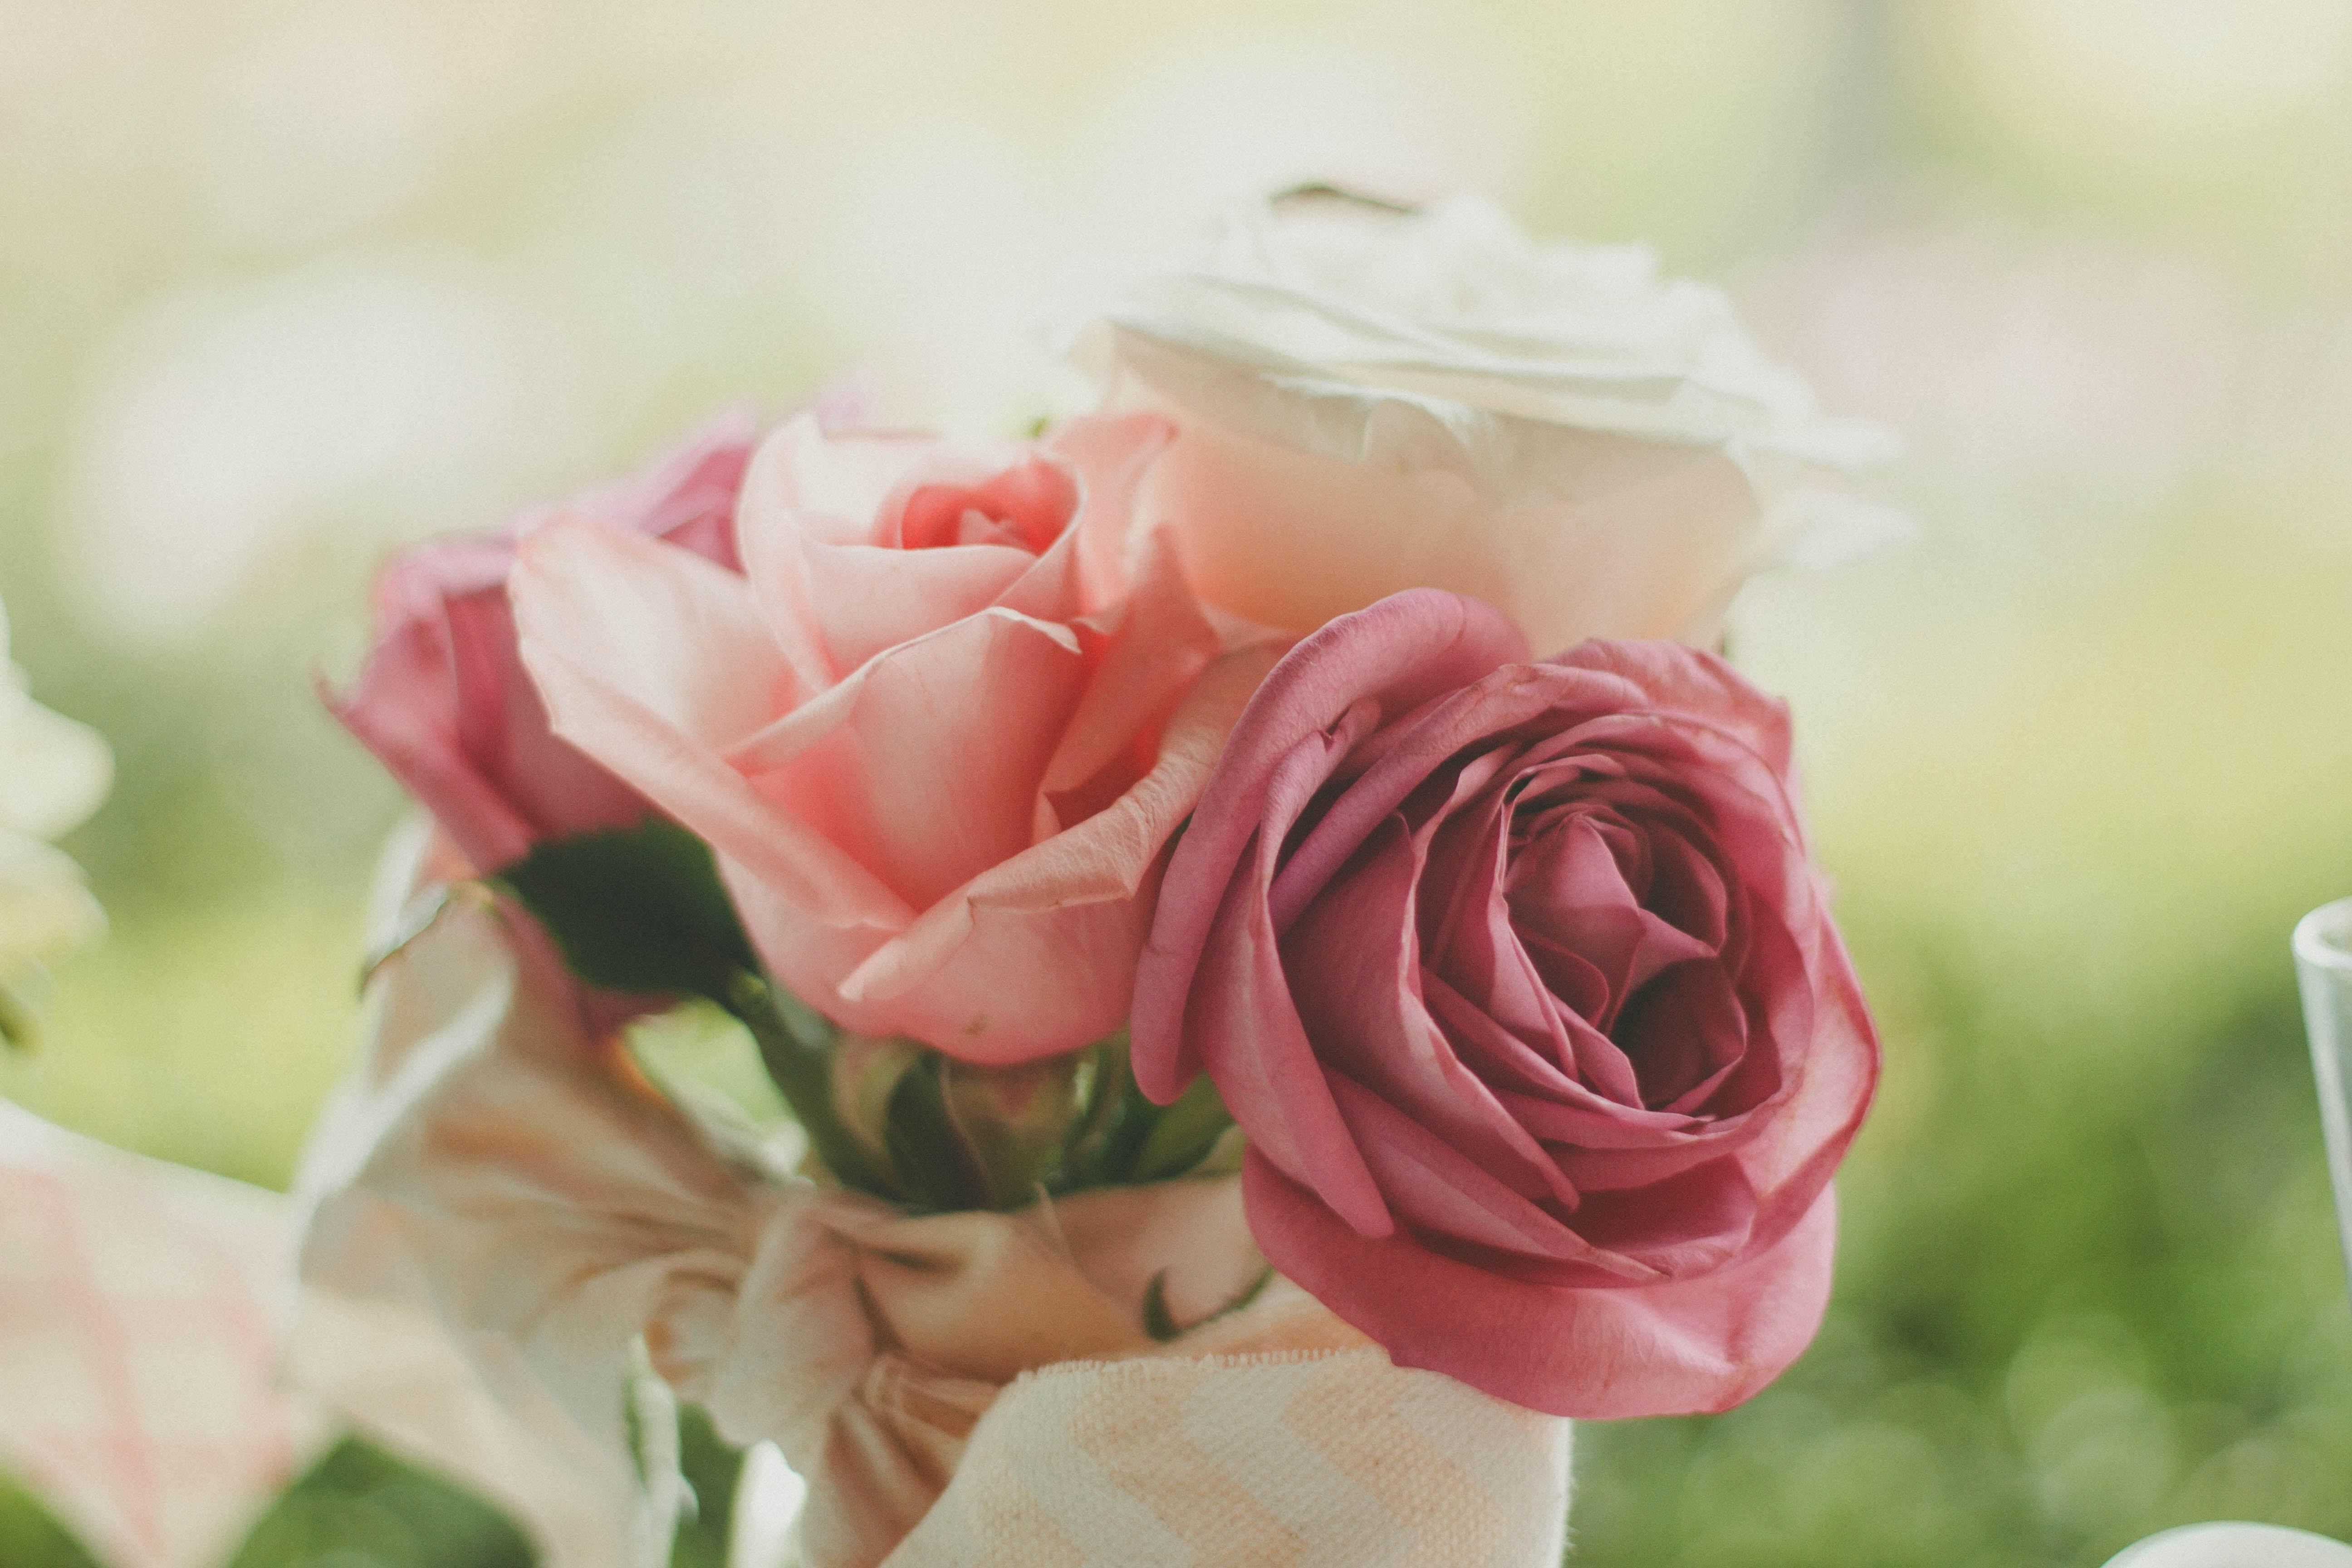 Closeup shot capturing a beautiful pink rose and its petals from the Walnut Creek